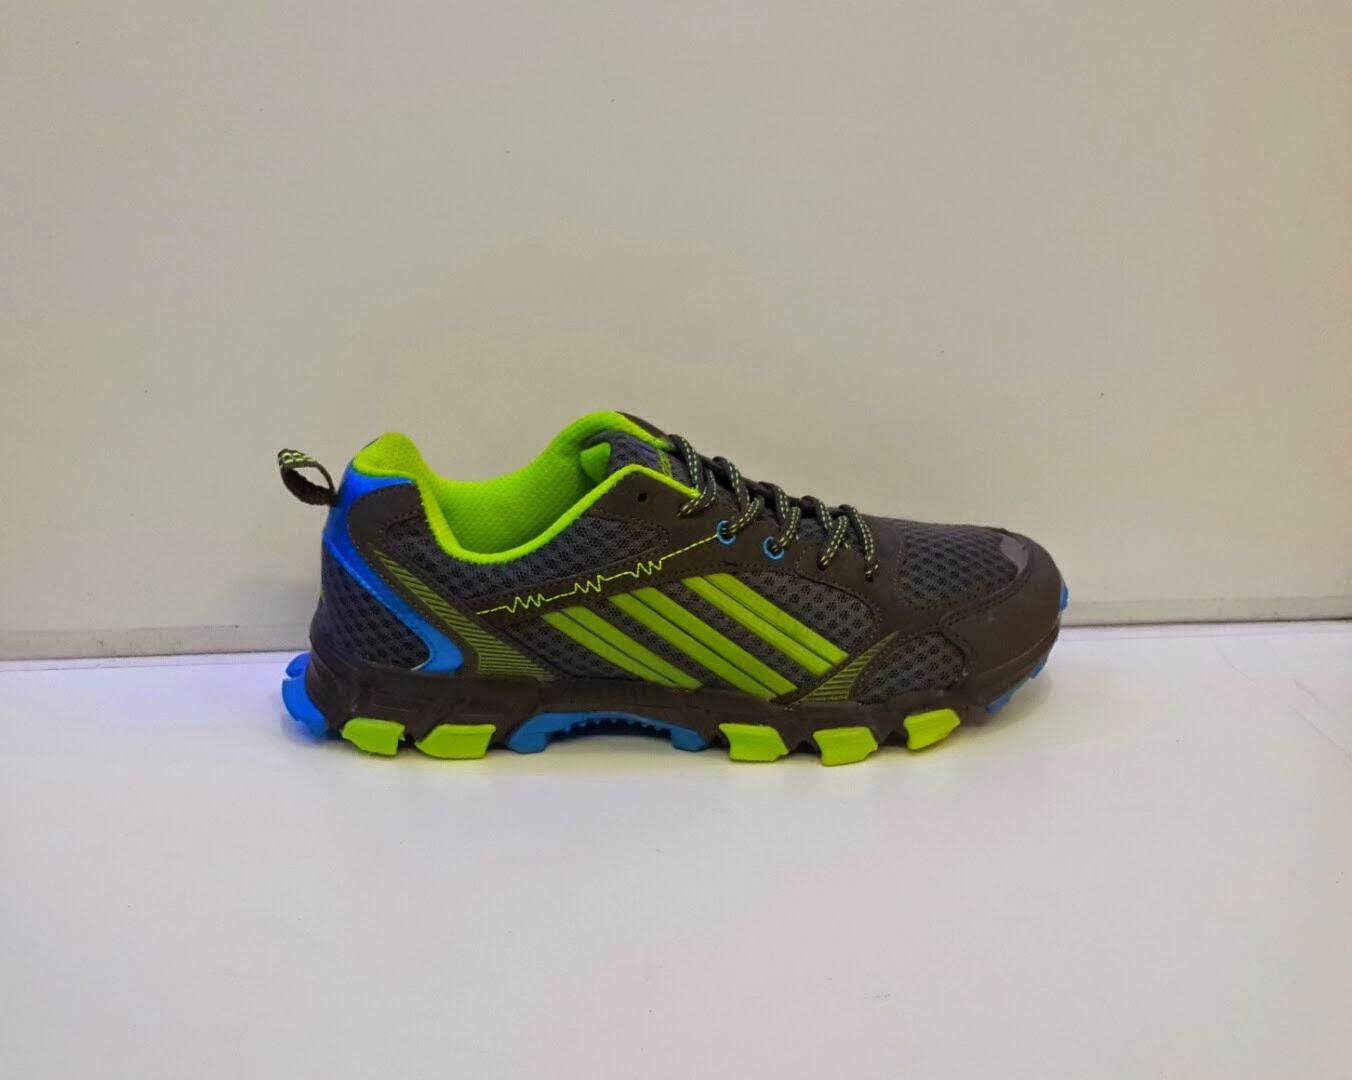 Adidas Supernova Abu kuning,Adidas Running,Adidas Import.